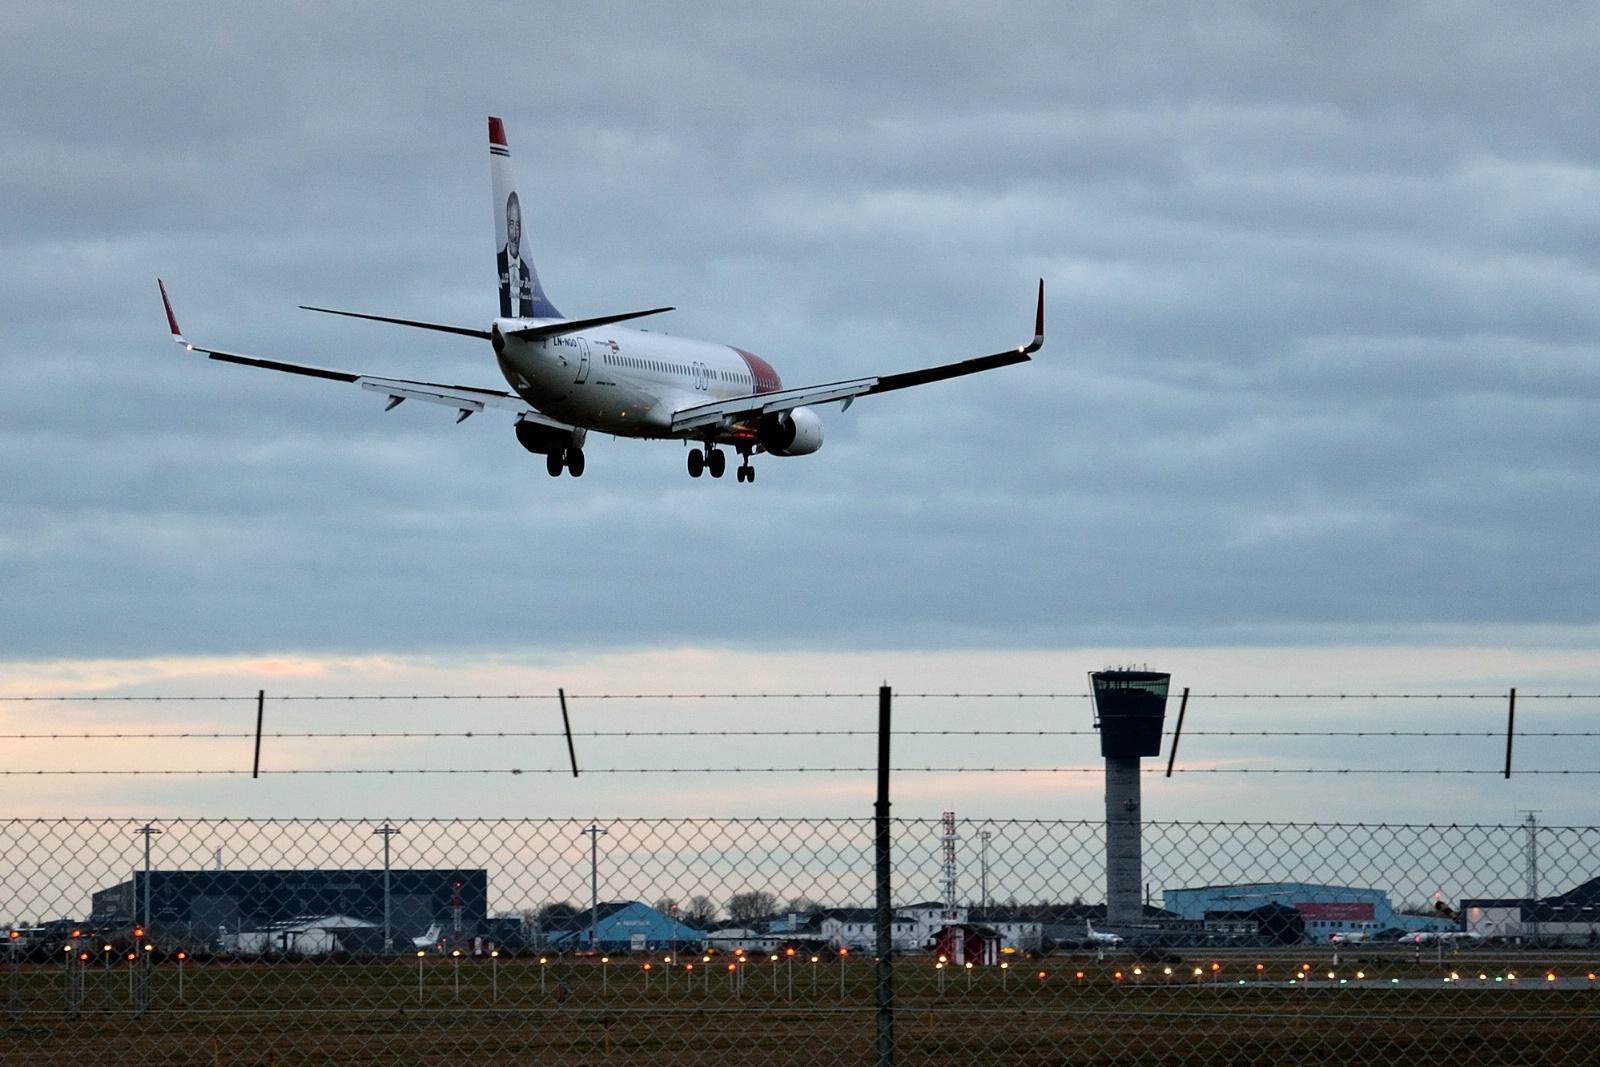 Ankommende fly i Københavns Lufthavn (Foto: Morten Lund Tiirikainen)